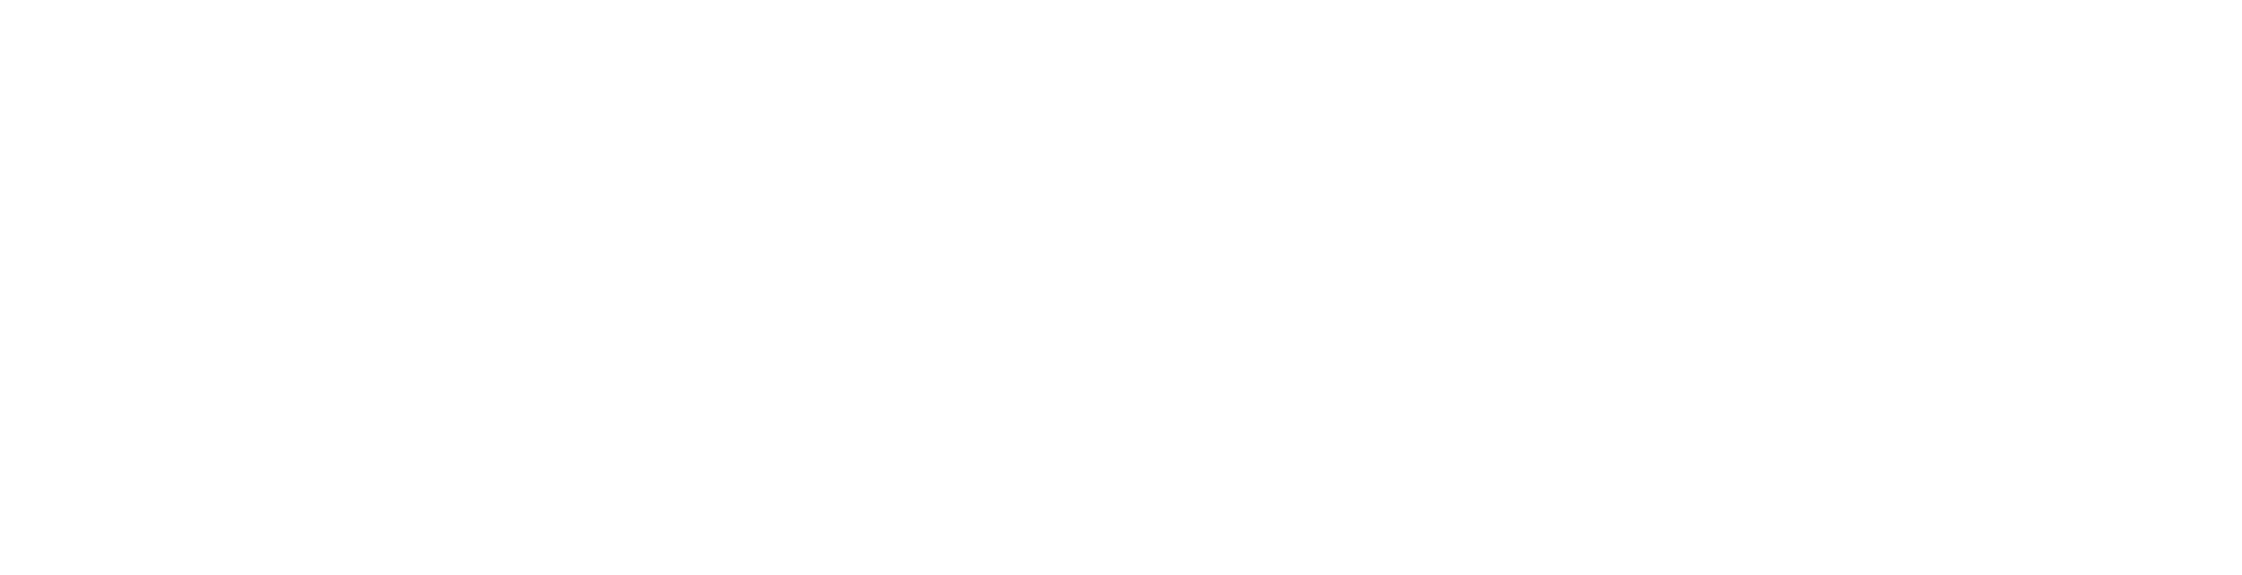 Summit Nashville - GPUG White.png